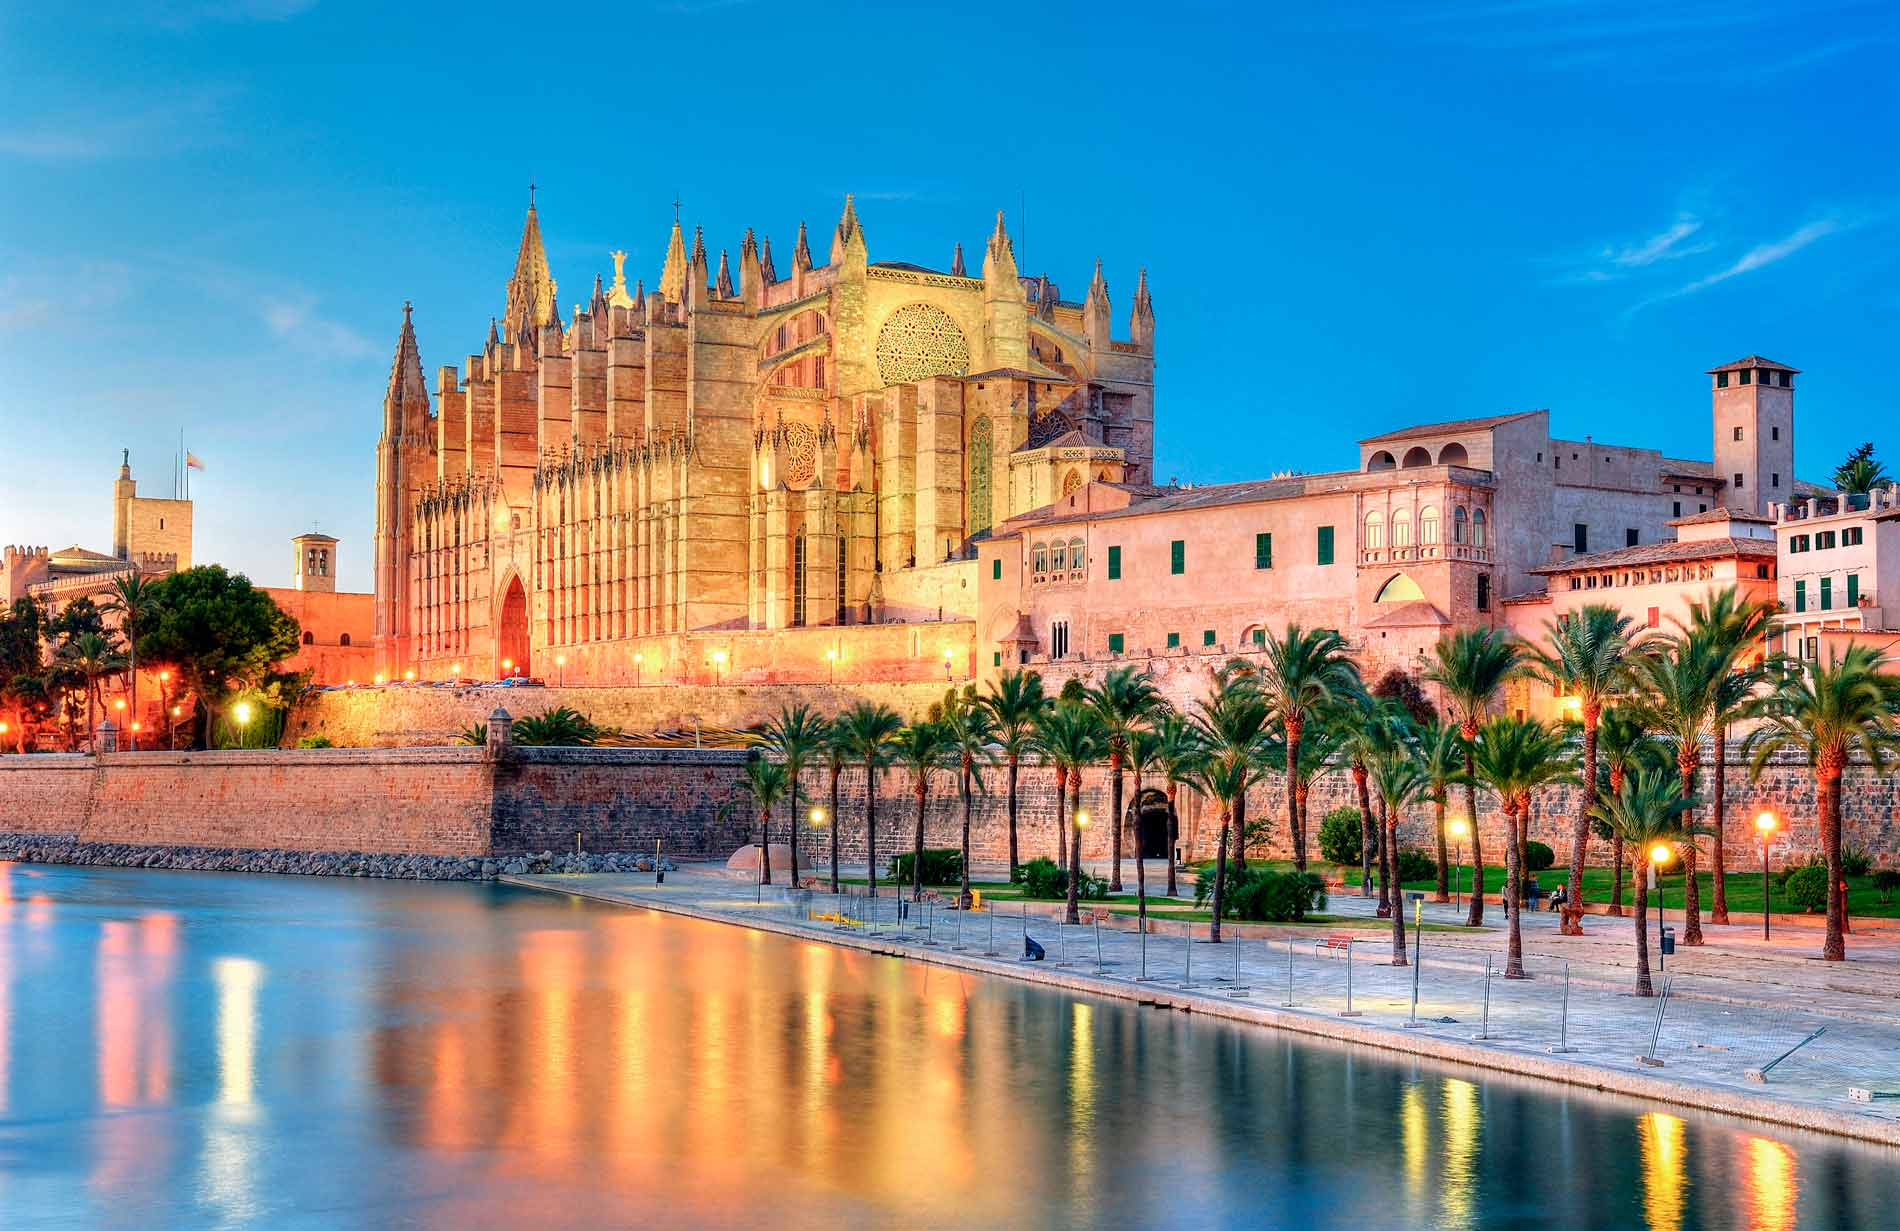 чаще фото испании красивых мест можете